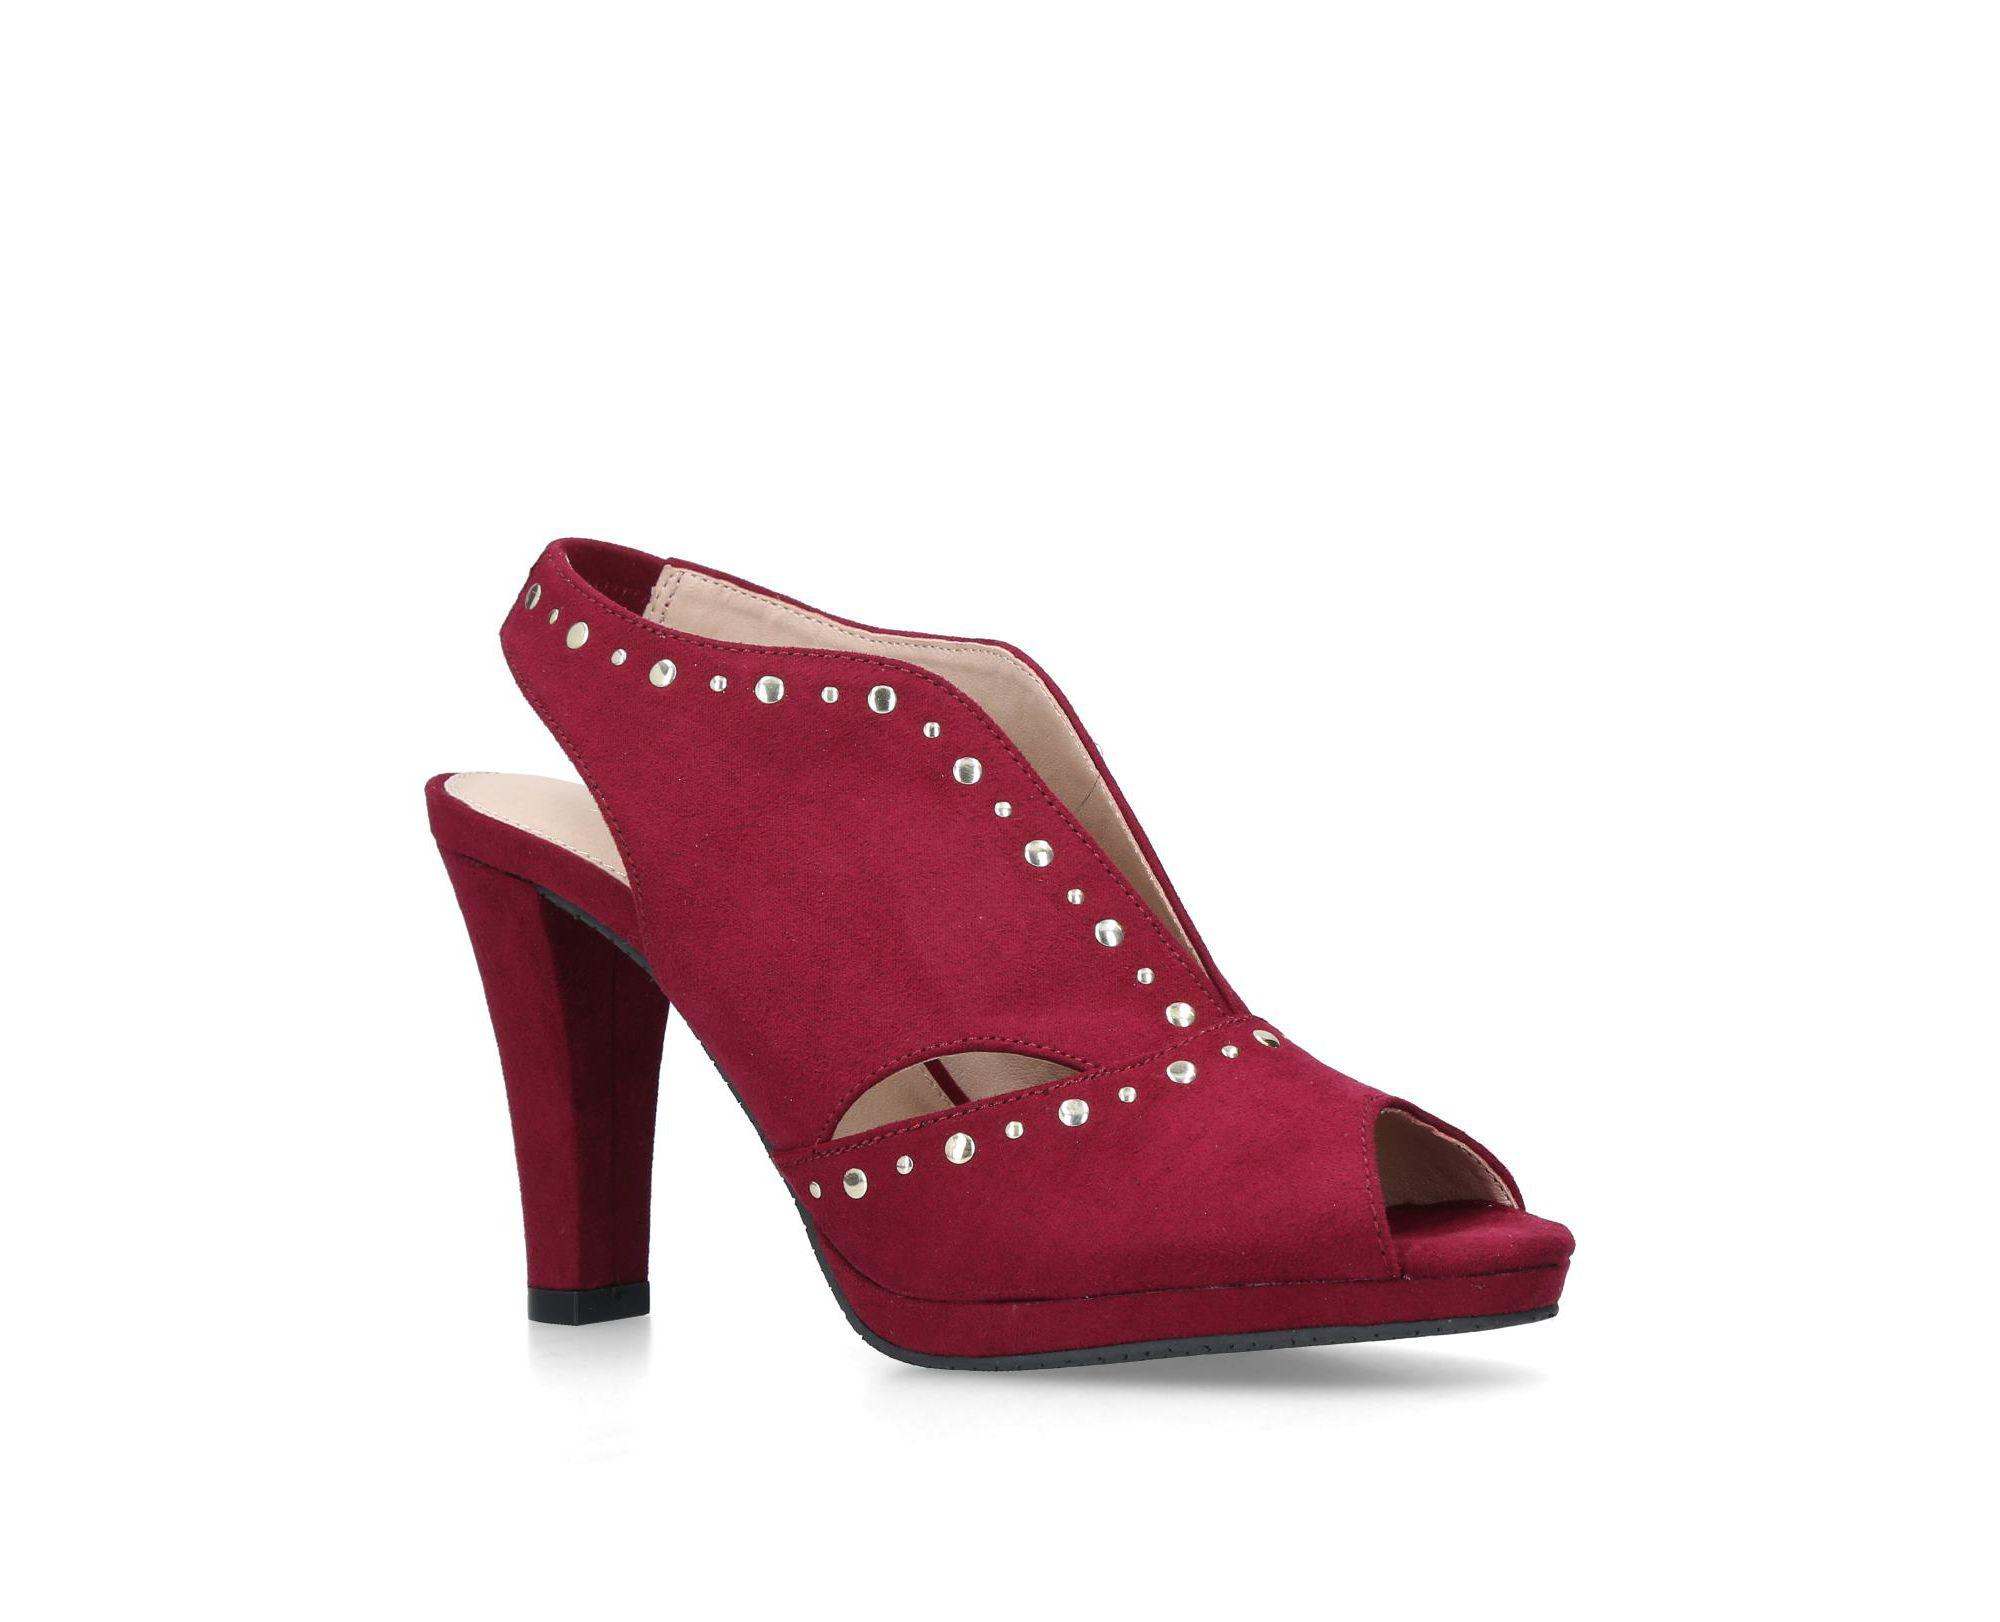 7c1cbf048a3 Carvela Kurt Geiger Wine  tasmin  High Heel Sandals in Red - Save 26 ...